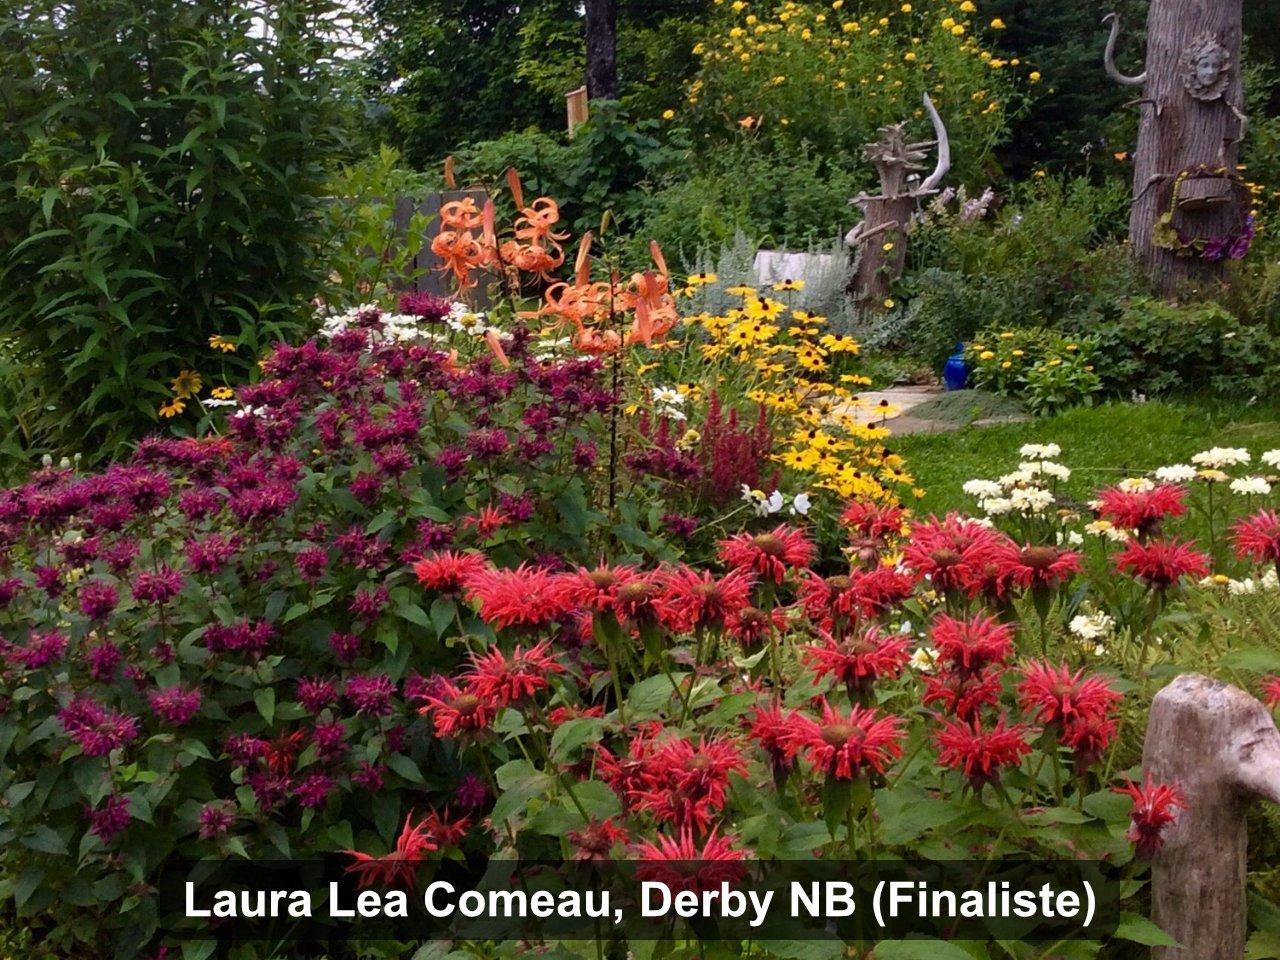 Finaliste - Laura Lea Comeau, Derby NB